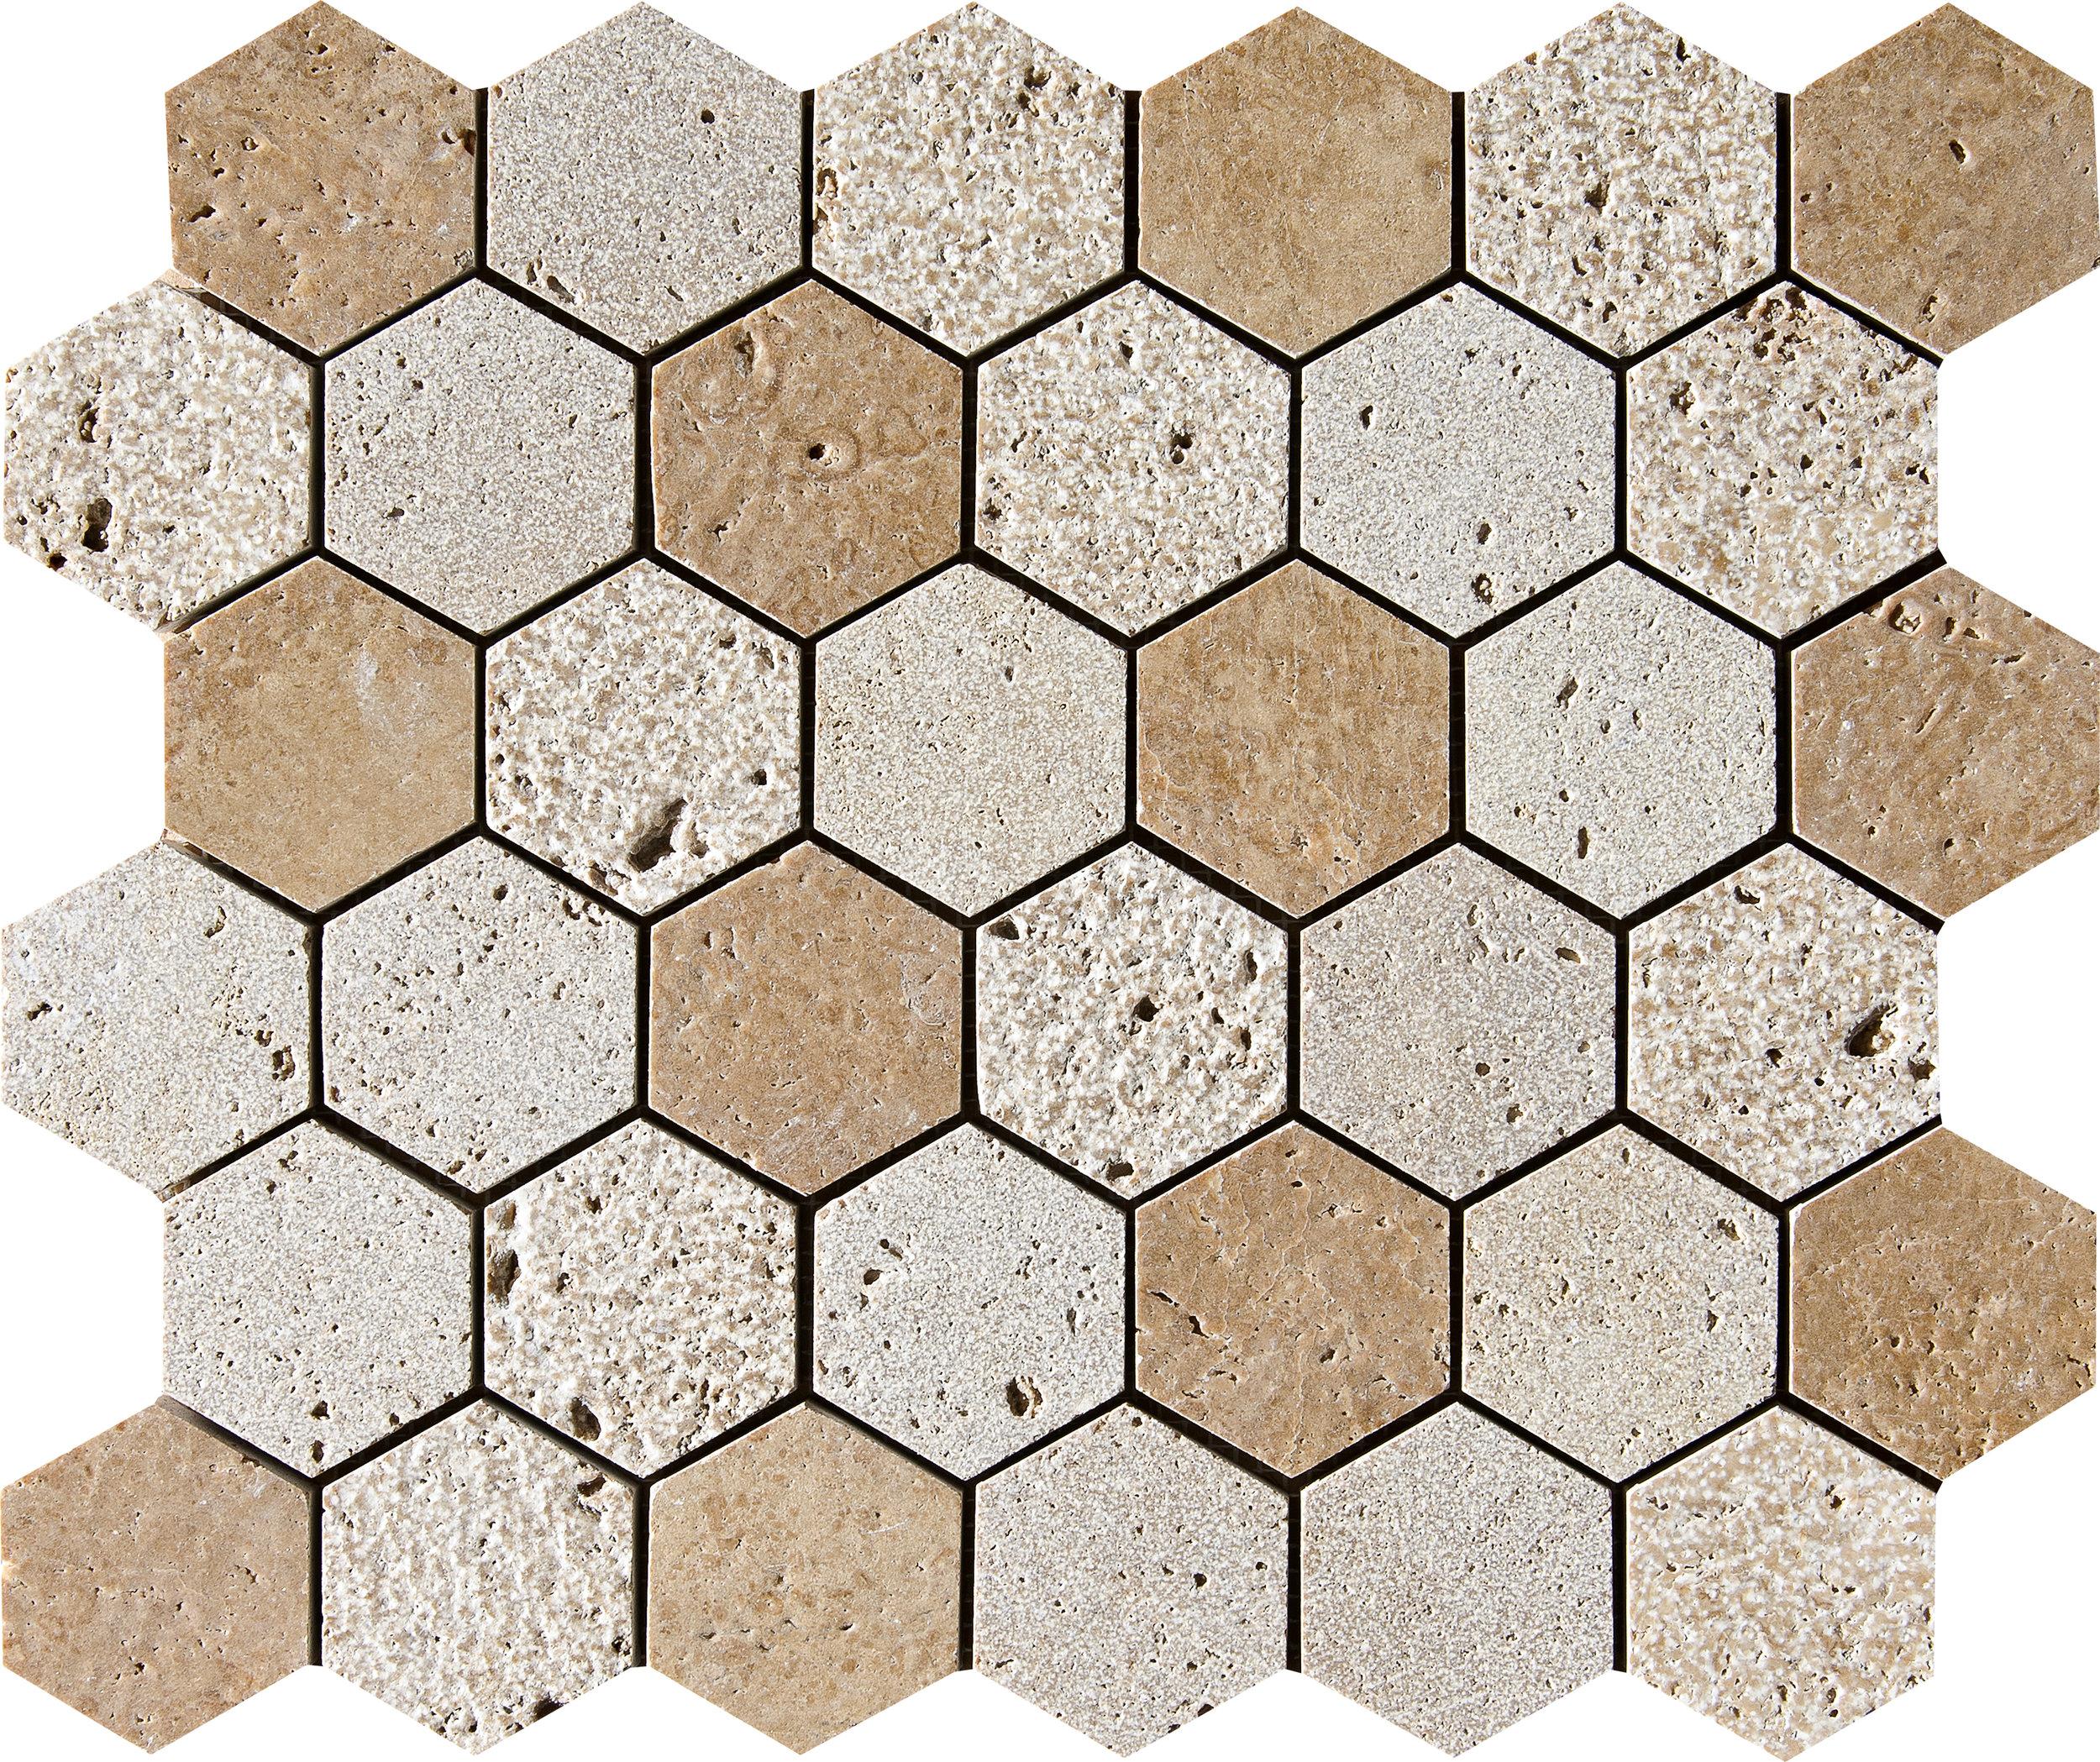 "MS01296 *(S.O.) walnut dark full hexagon textured mosaic 10 3/8""x12""x3/8"" sheets"